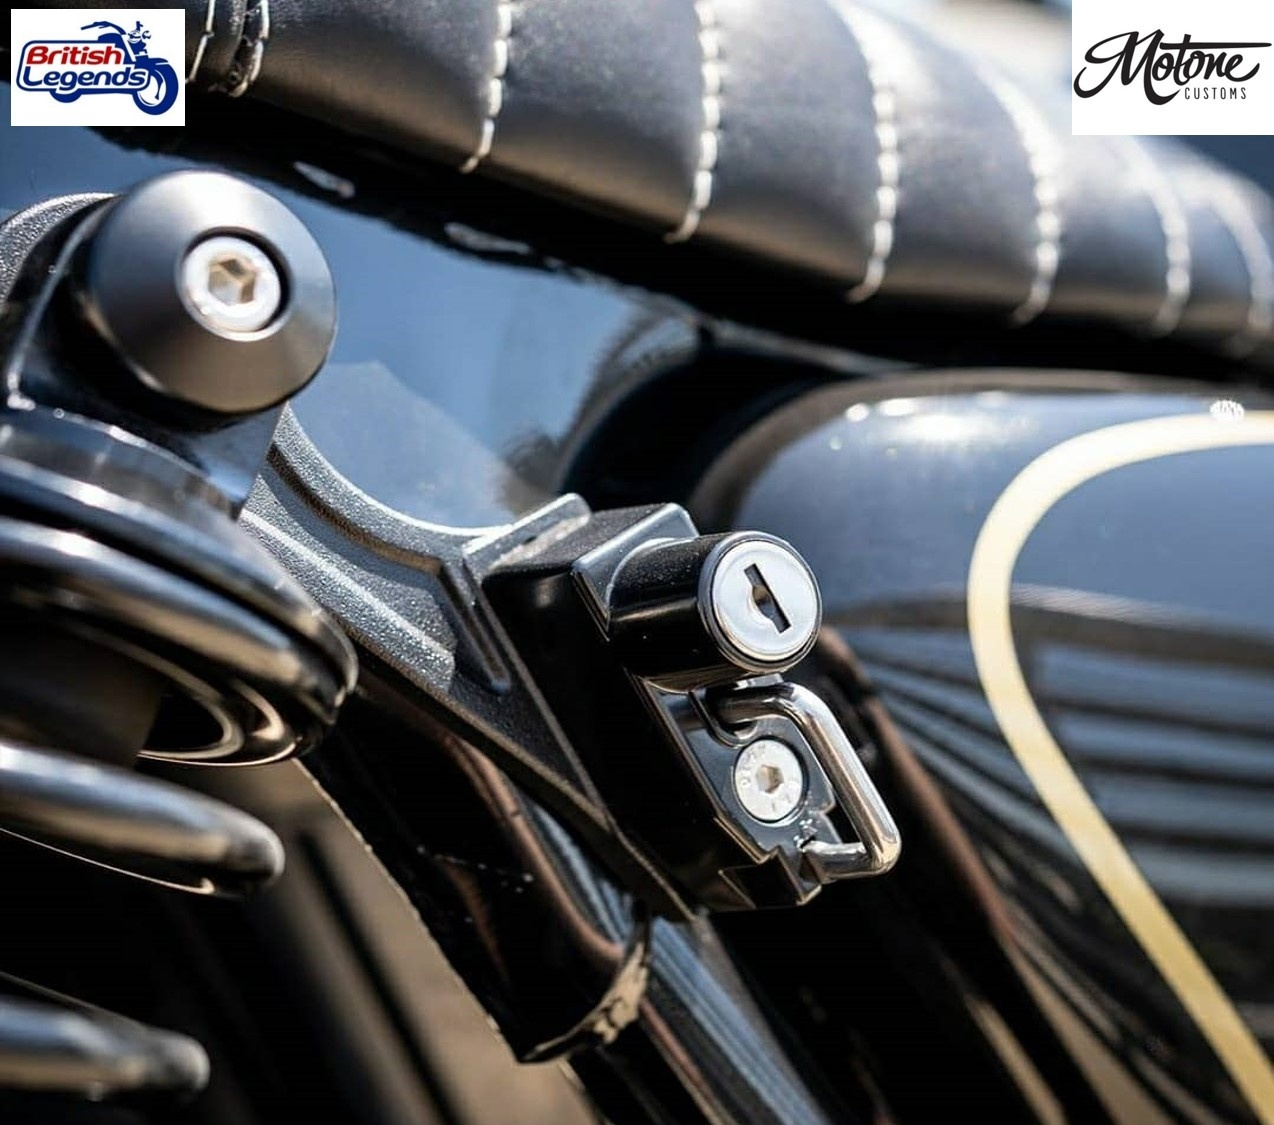 Helmet Safety Lock For Triumph Twins Triumph Parts